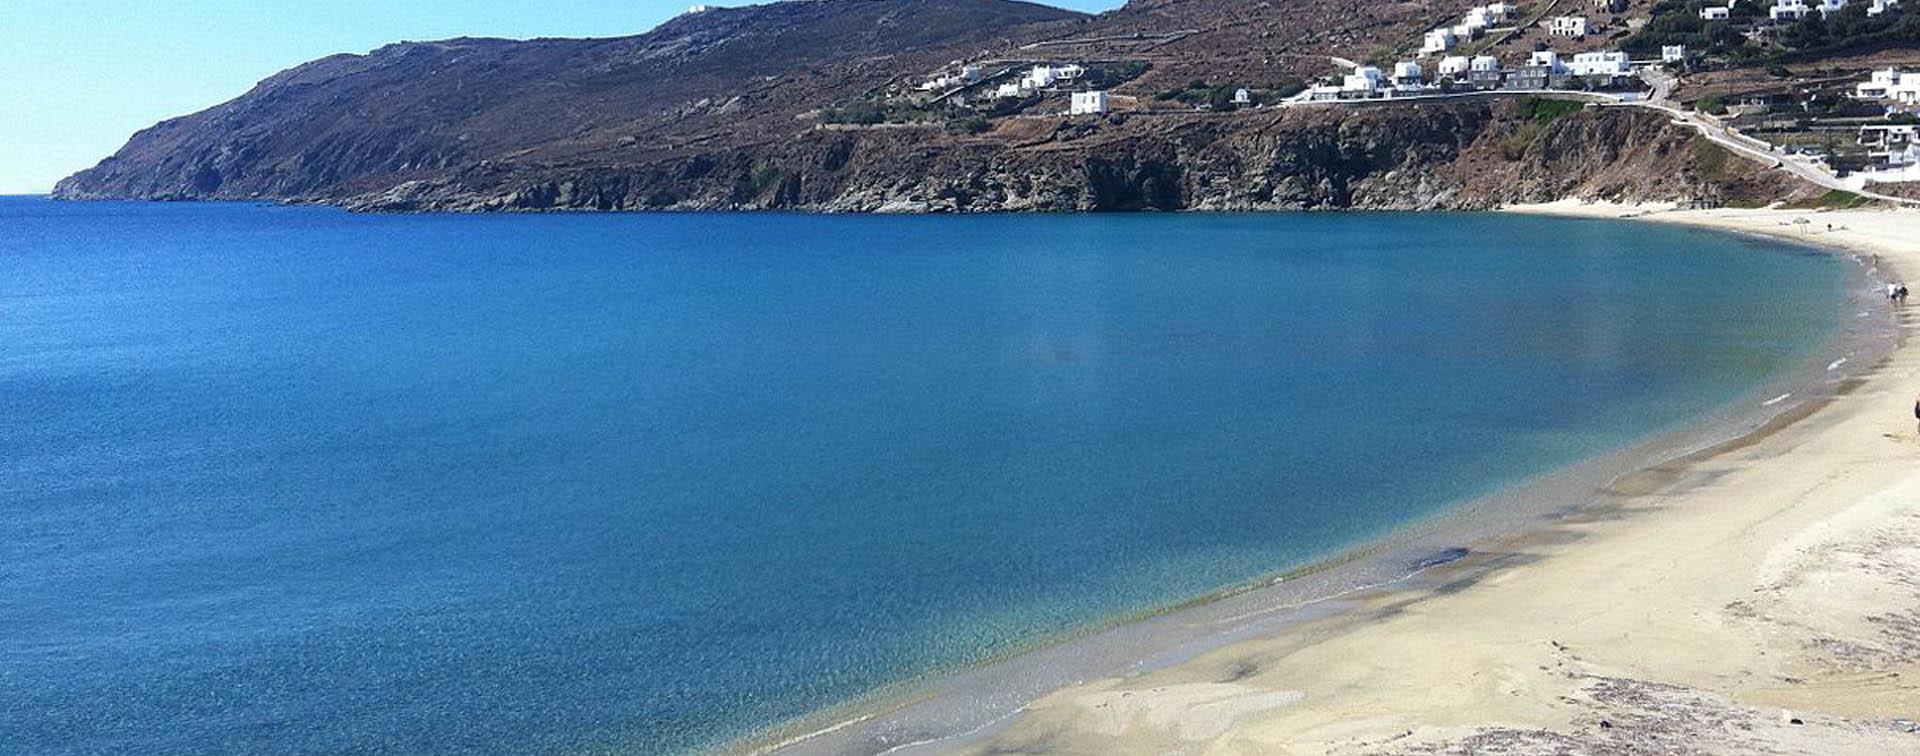 Kalo Livadi Beach - Mykonos